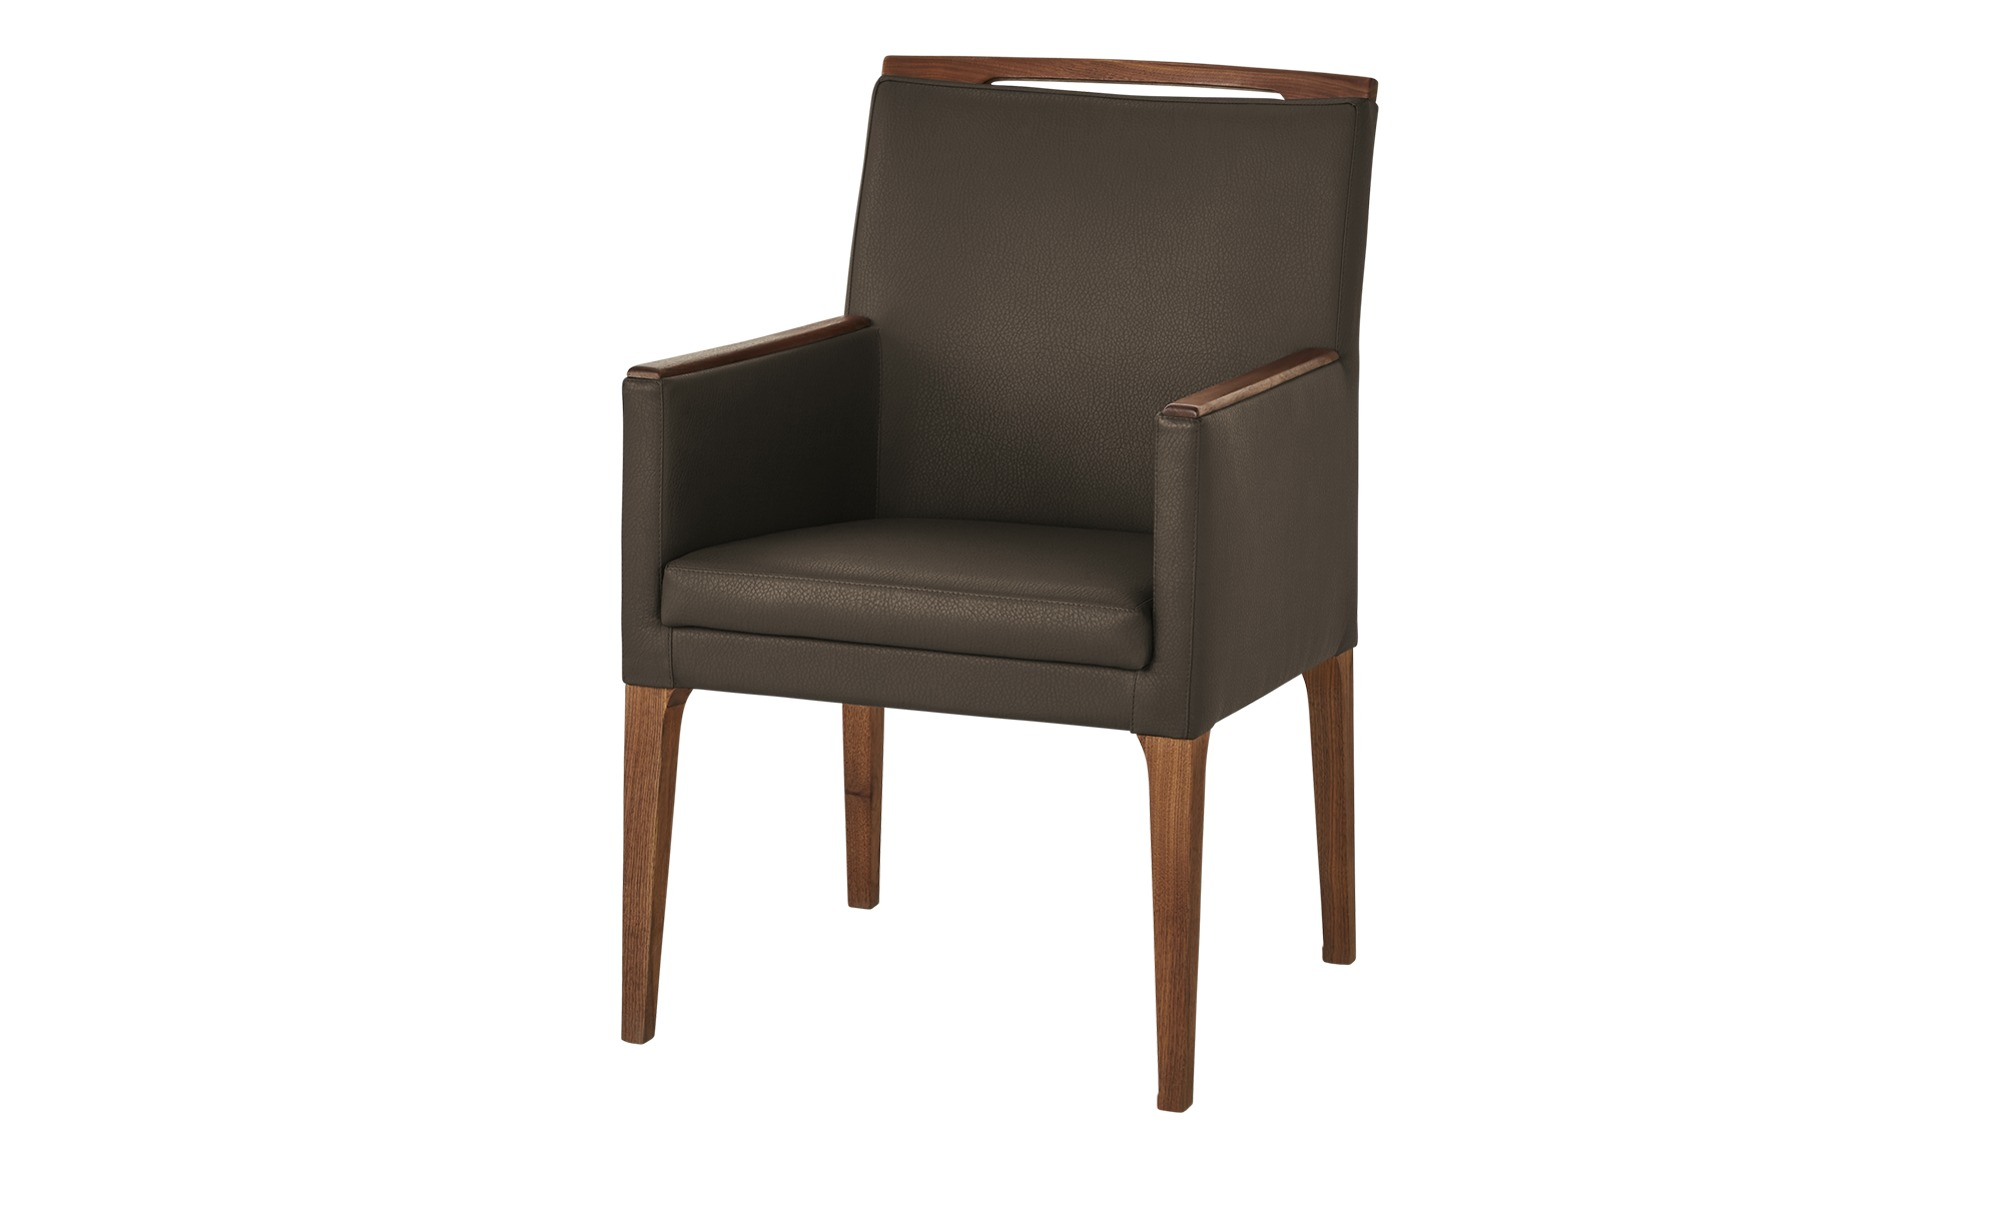 Wohnwert Sessel  Botho ¦ braun ¦ Maße (cm): B: 58 H: 91 T: 65 Stühle > Esszimmerstühle > Esszimmerstühle mit Armlehnen - Höffner